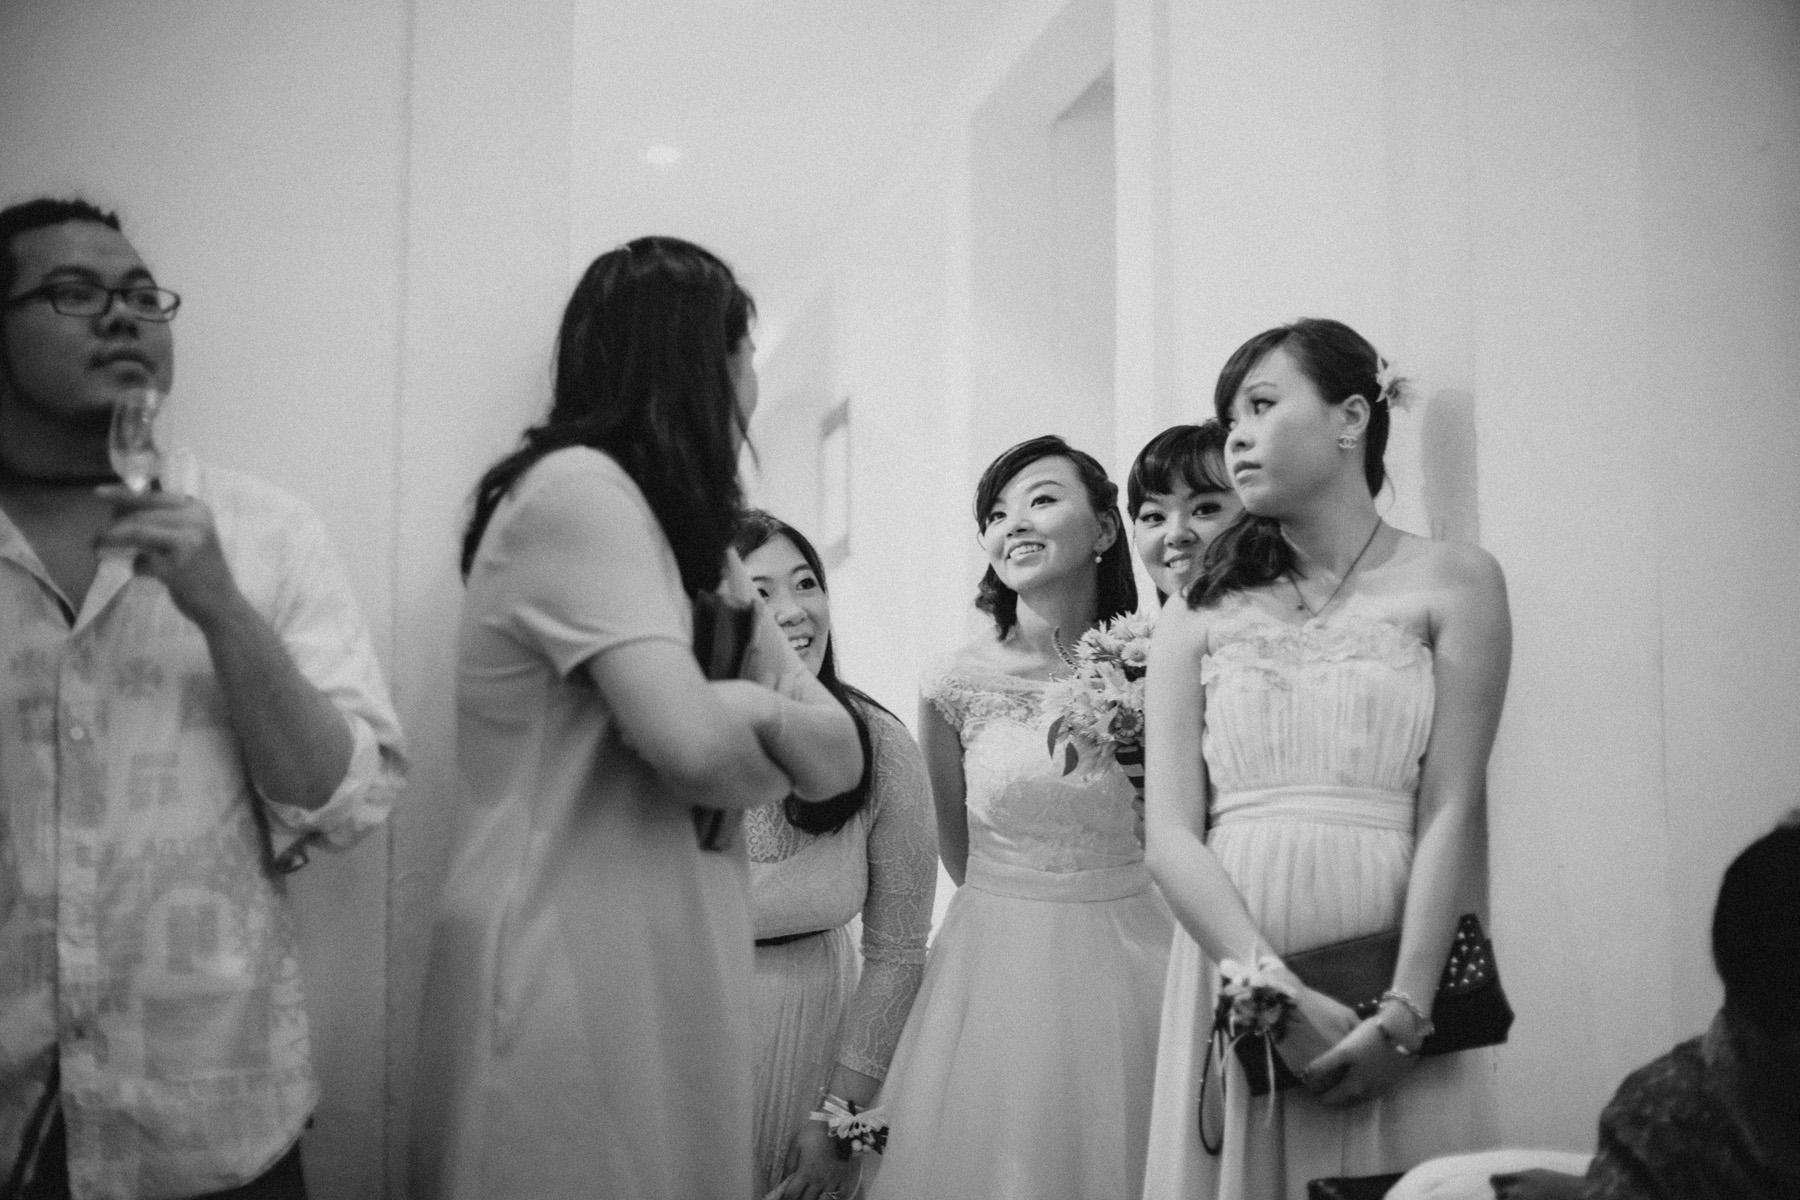 singapore-wedding-travel-photographer-faith-alvin-wedding-wmt-46.jpg